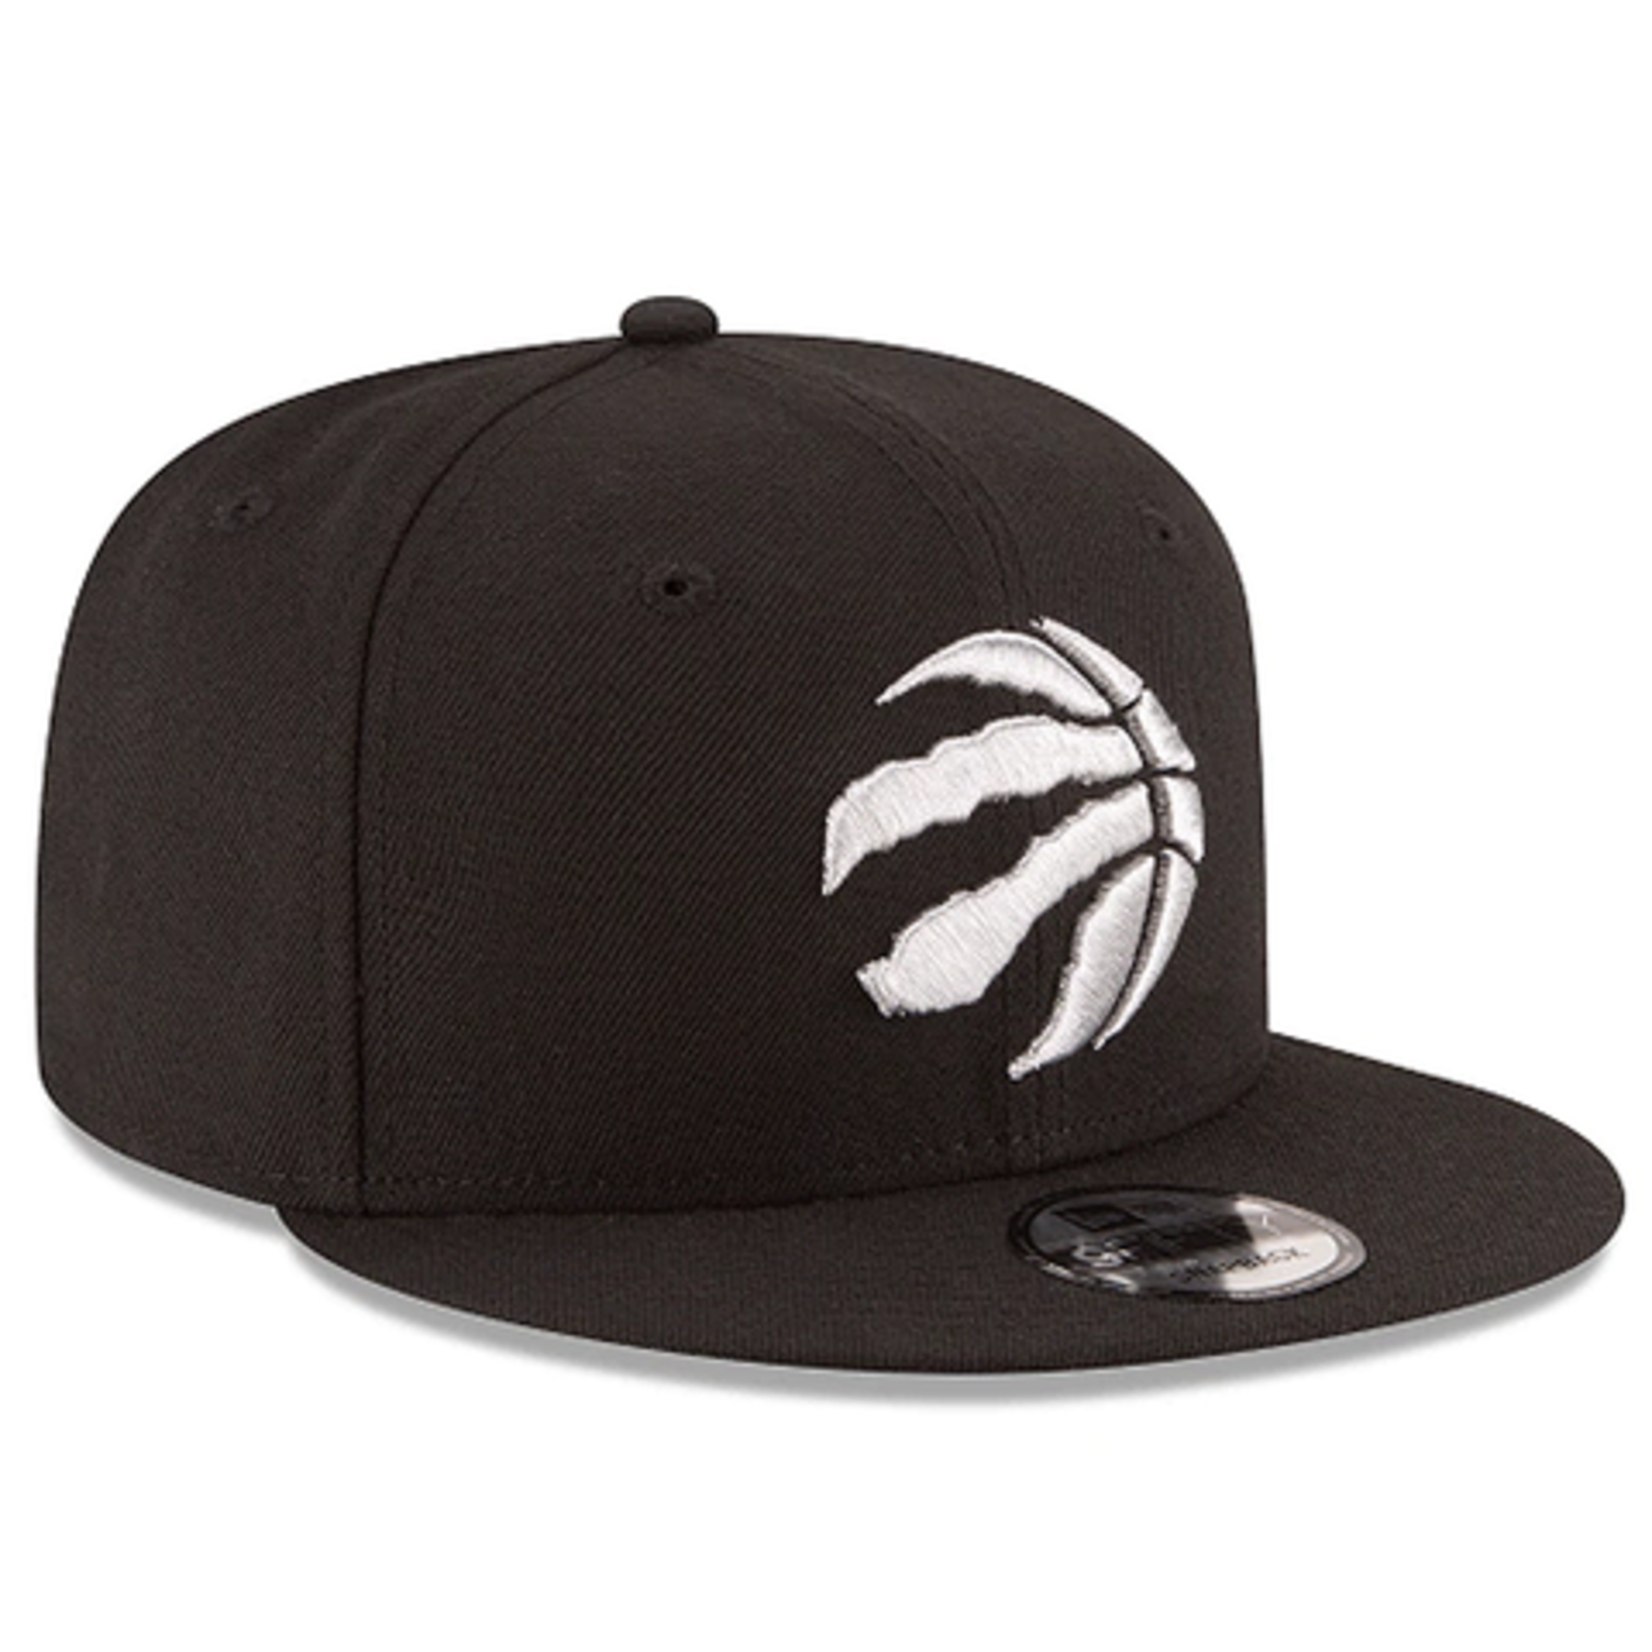 New Era New Era Hat, Basic 950, NBA, Toronto Raptors OTC, OS